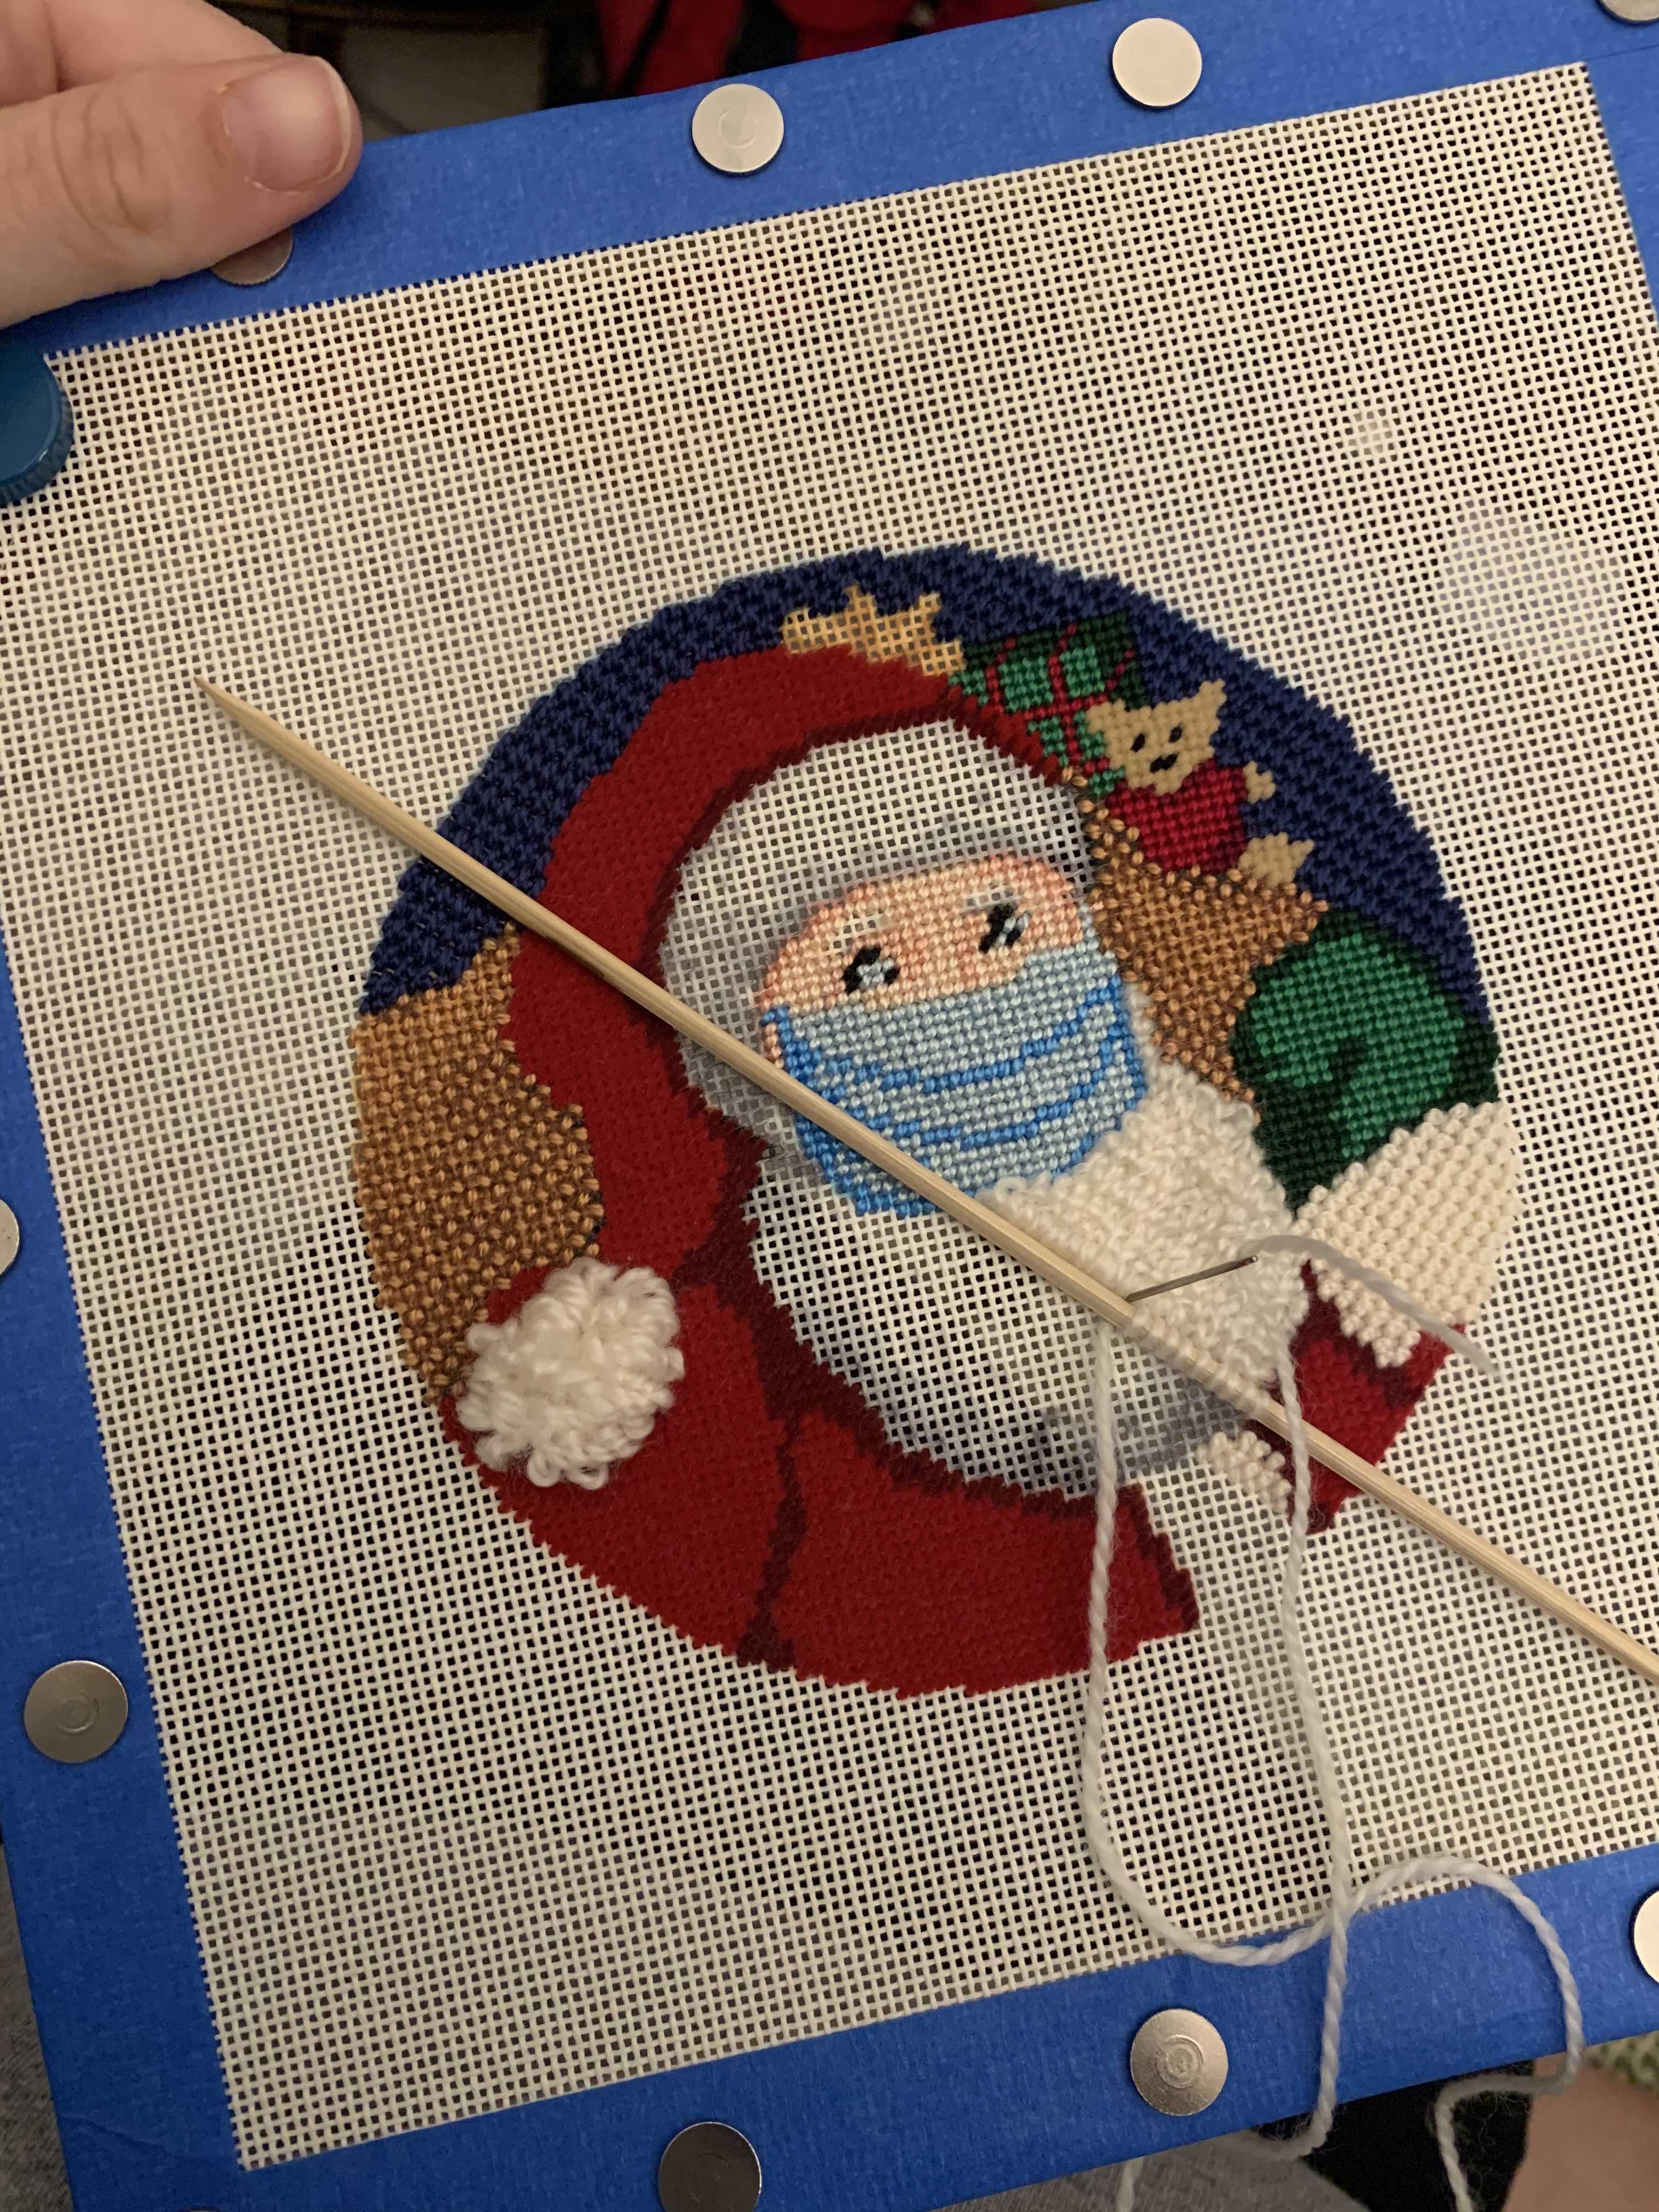 NeedlePaint Santa's X Mask Ornament.3